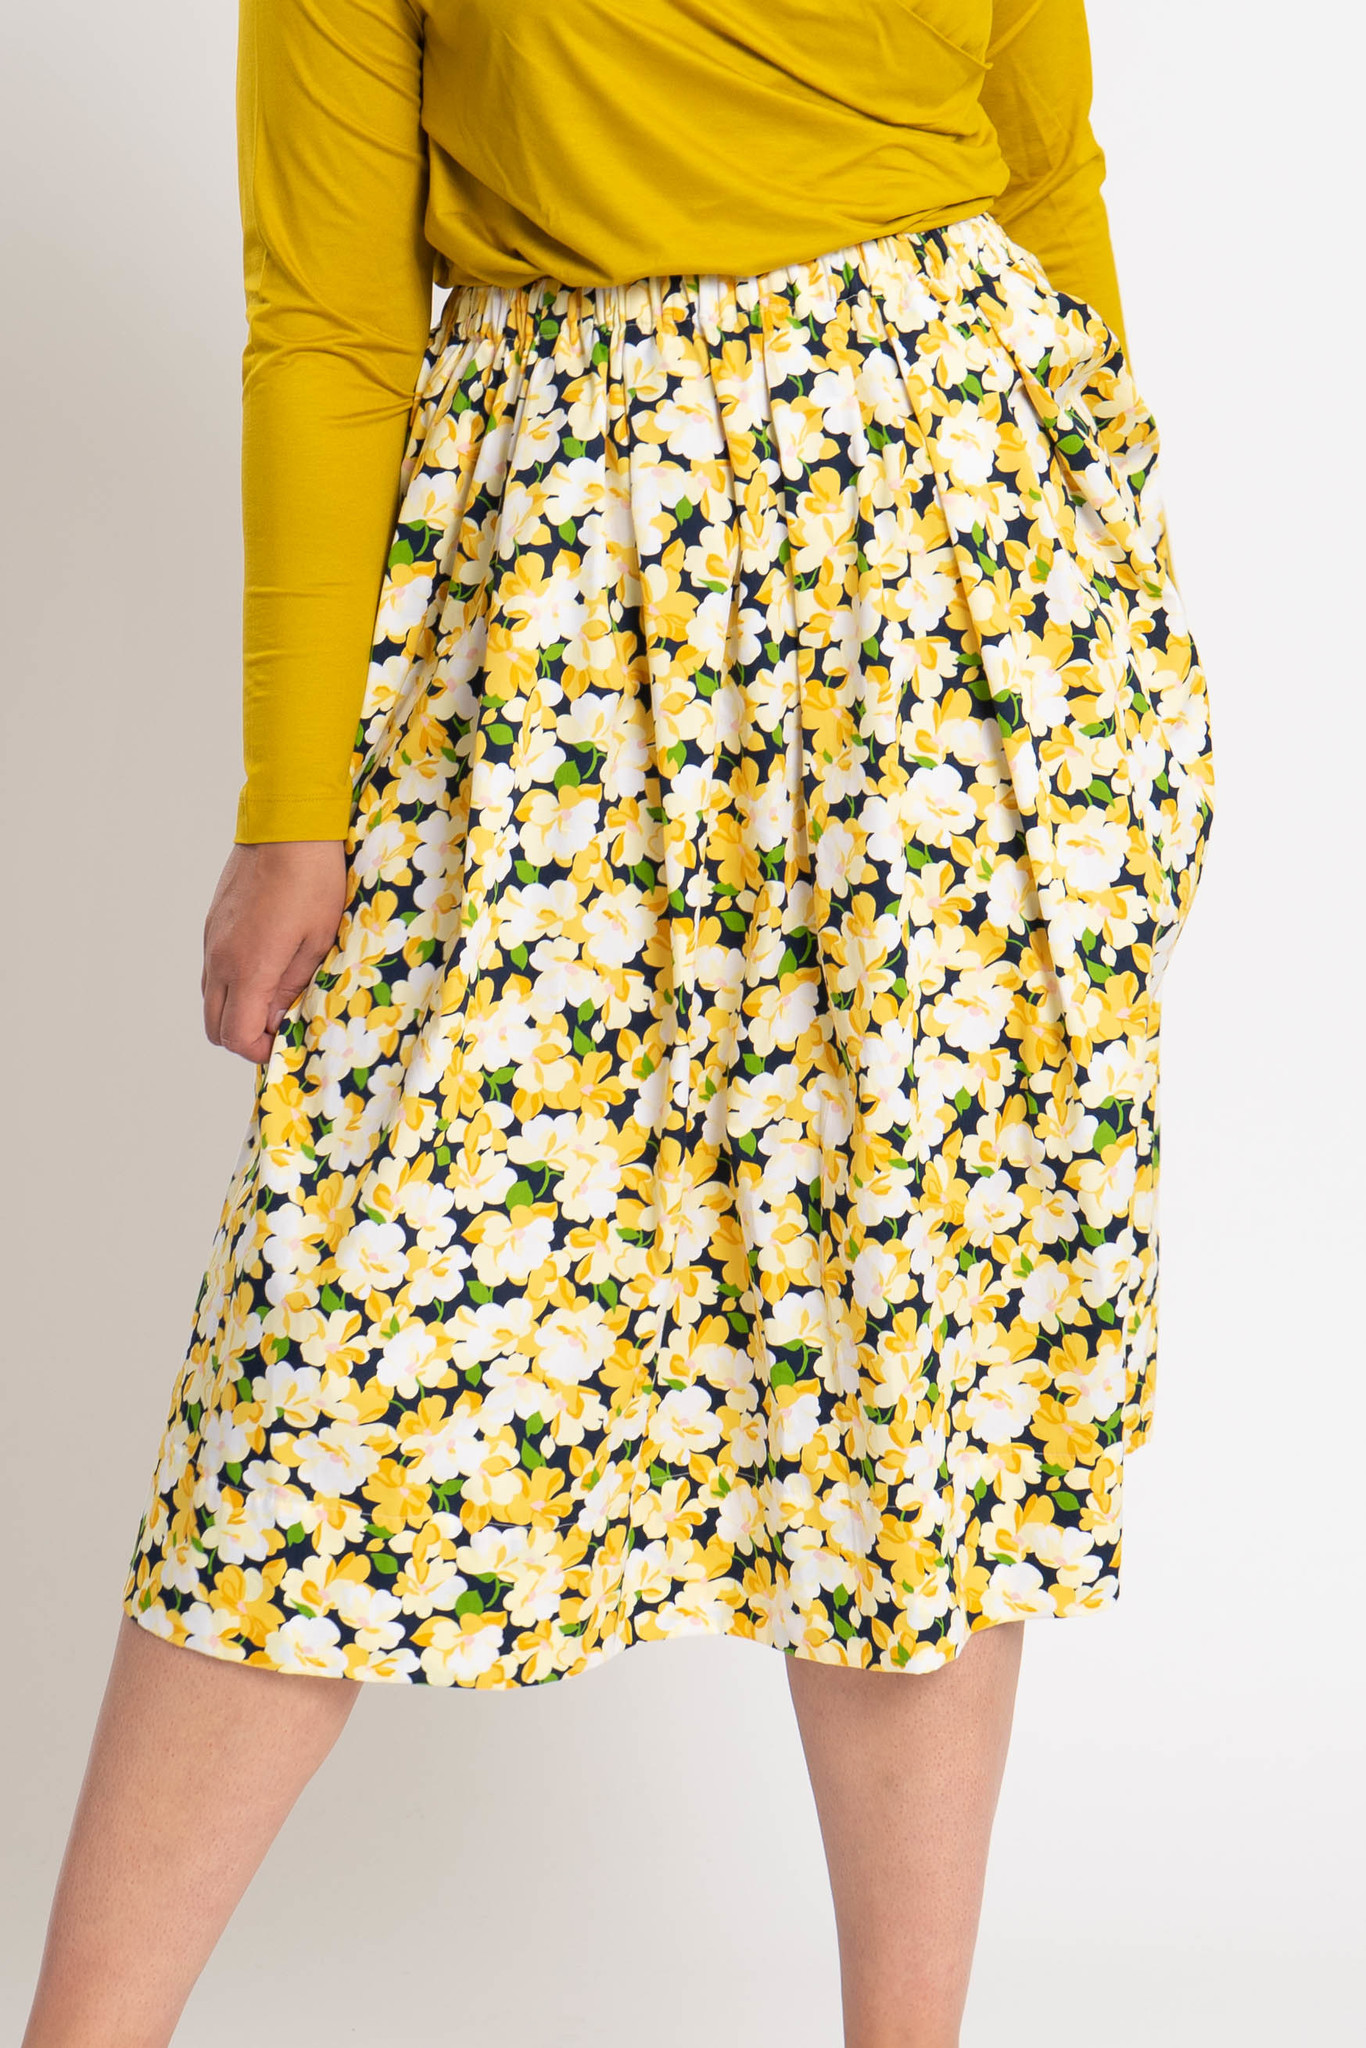 TULIP Skirt in Cotton-5